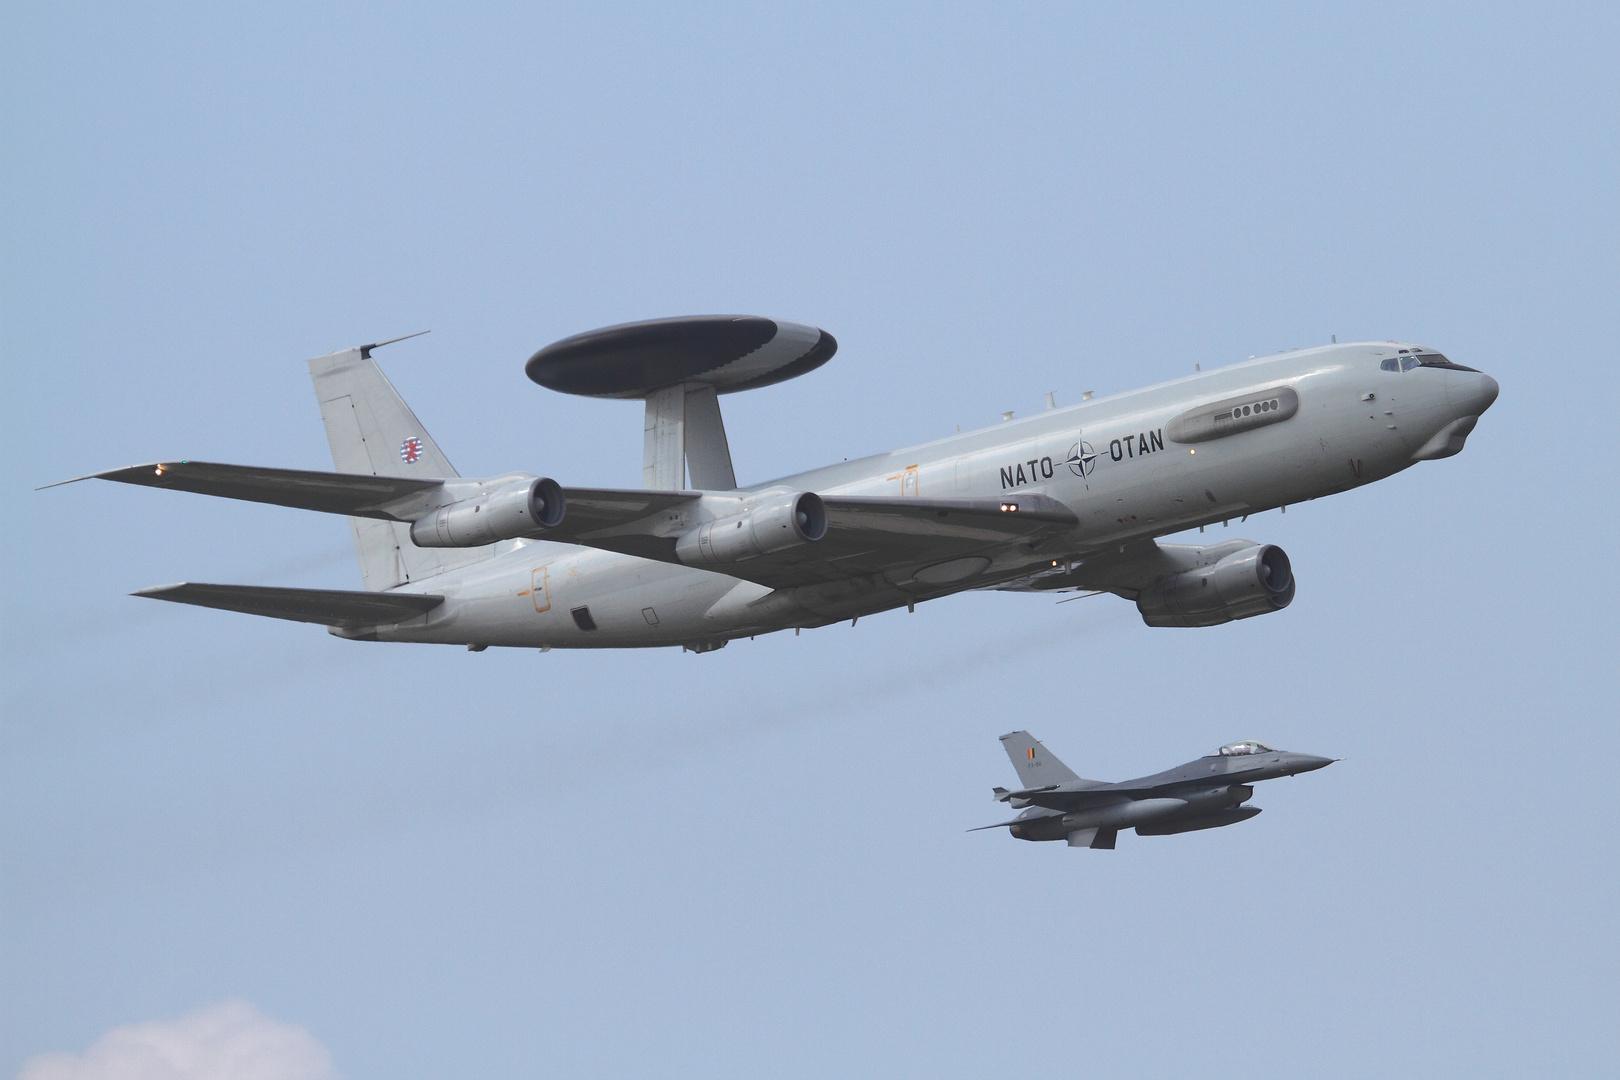 Belgian Air Force Days 2014 #02